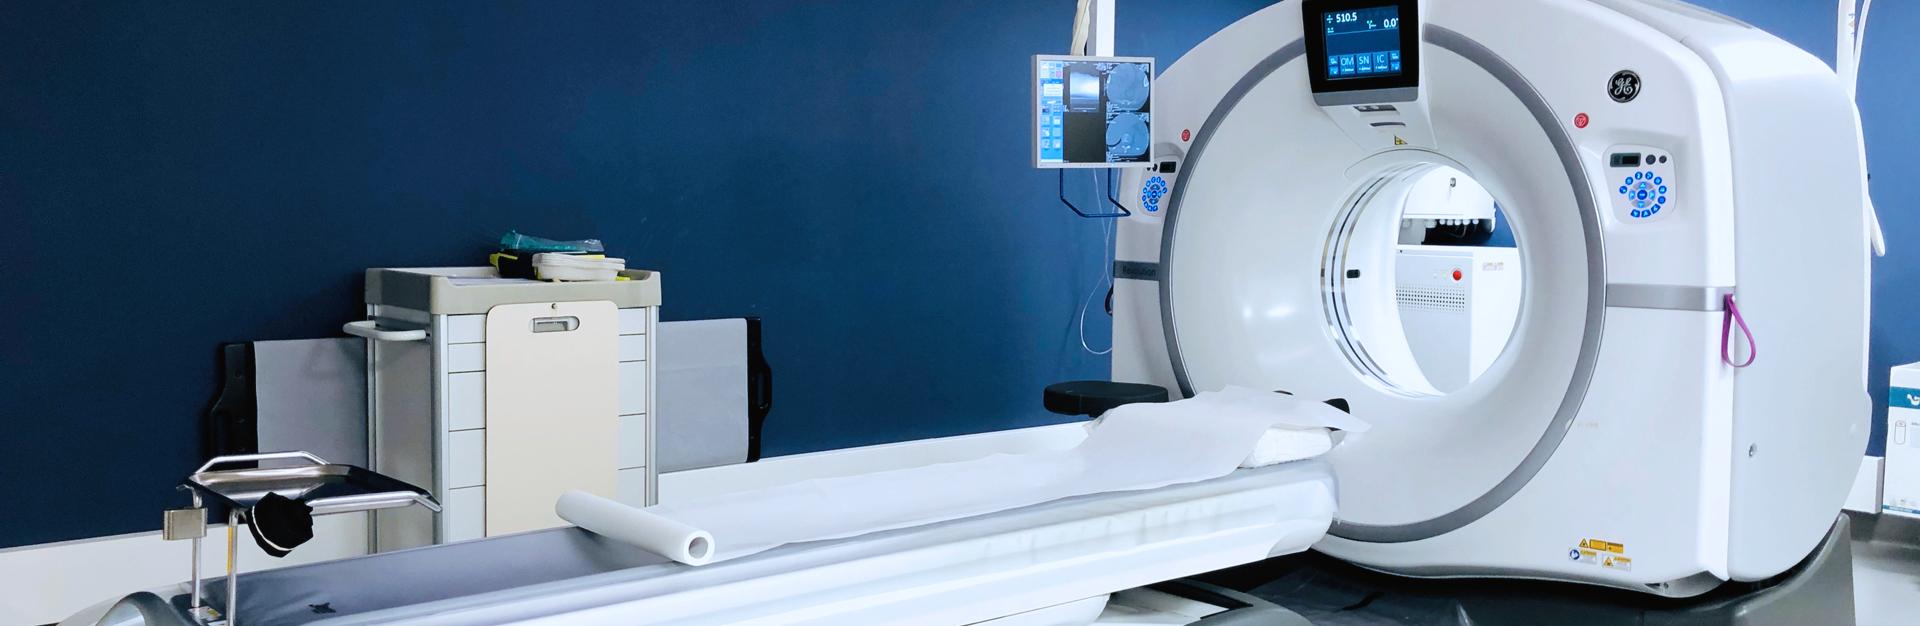 Radiologie scanner Sete Frontignan